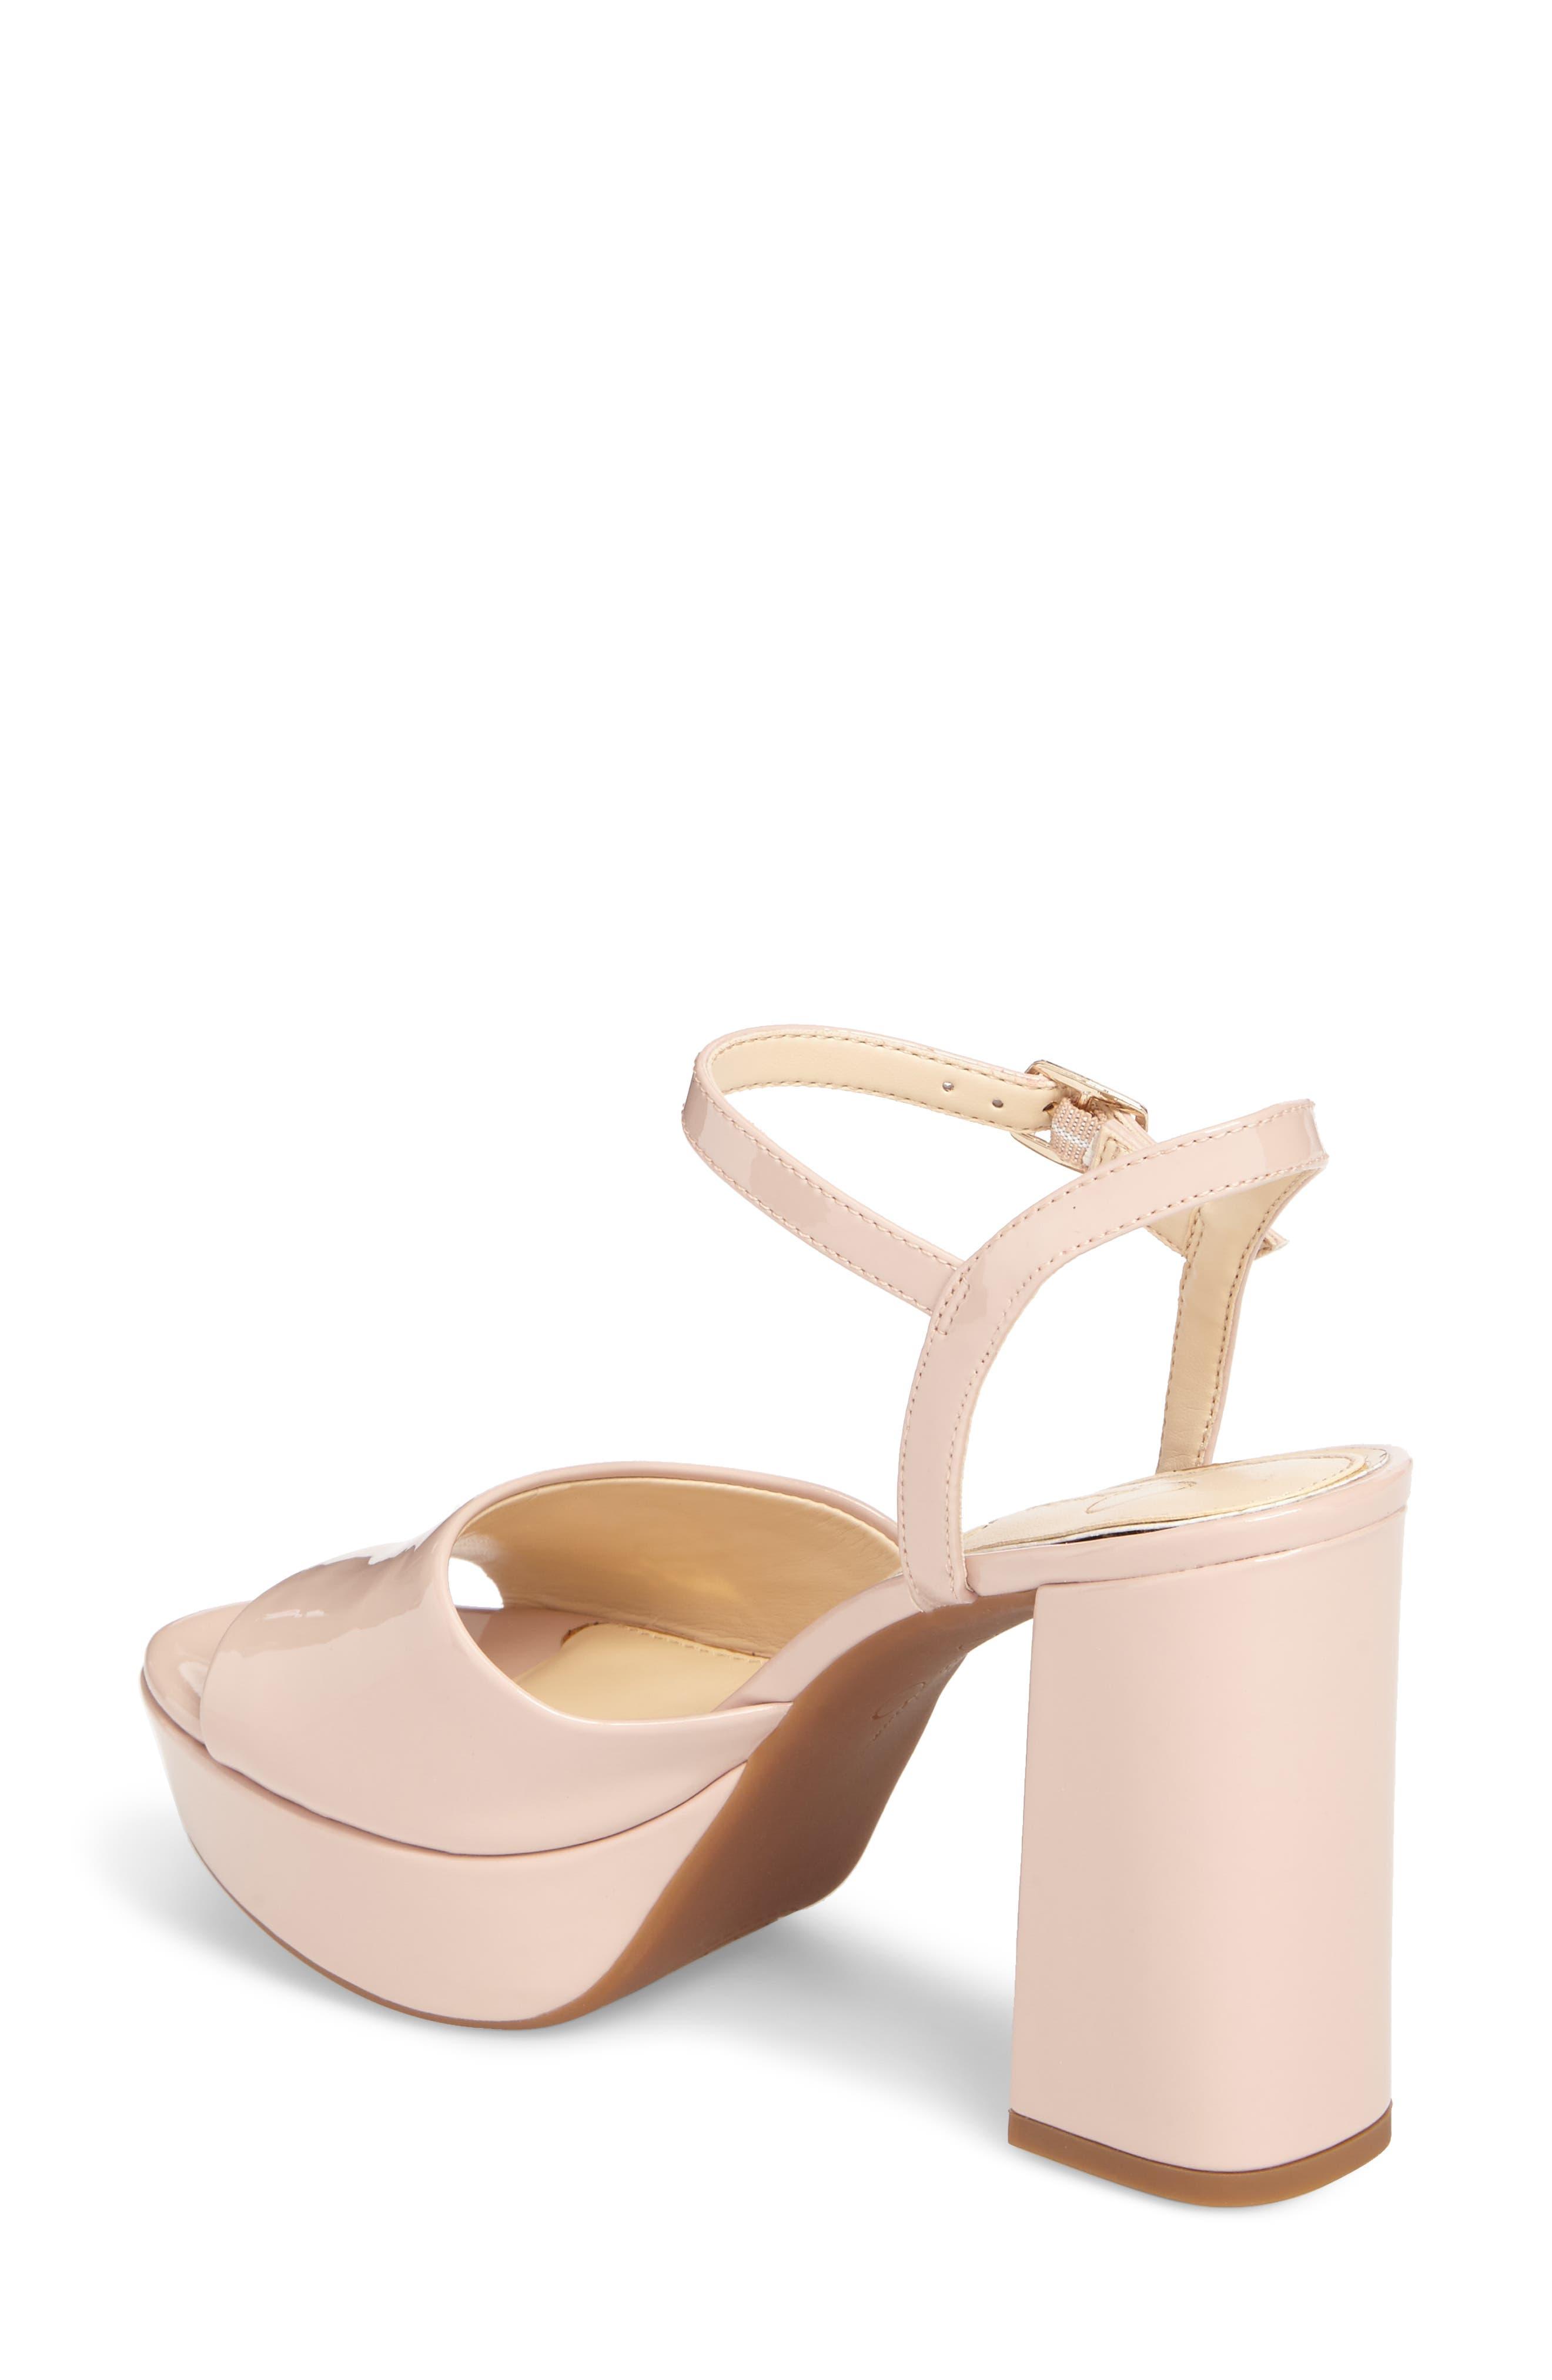 Kerrick Platform Sandal,                             Alternate thumbnail 4, color,